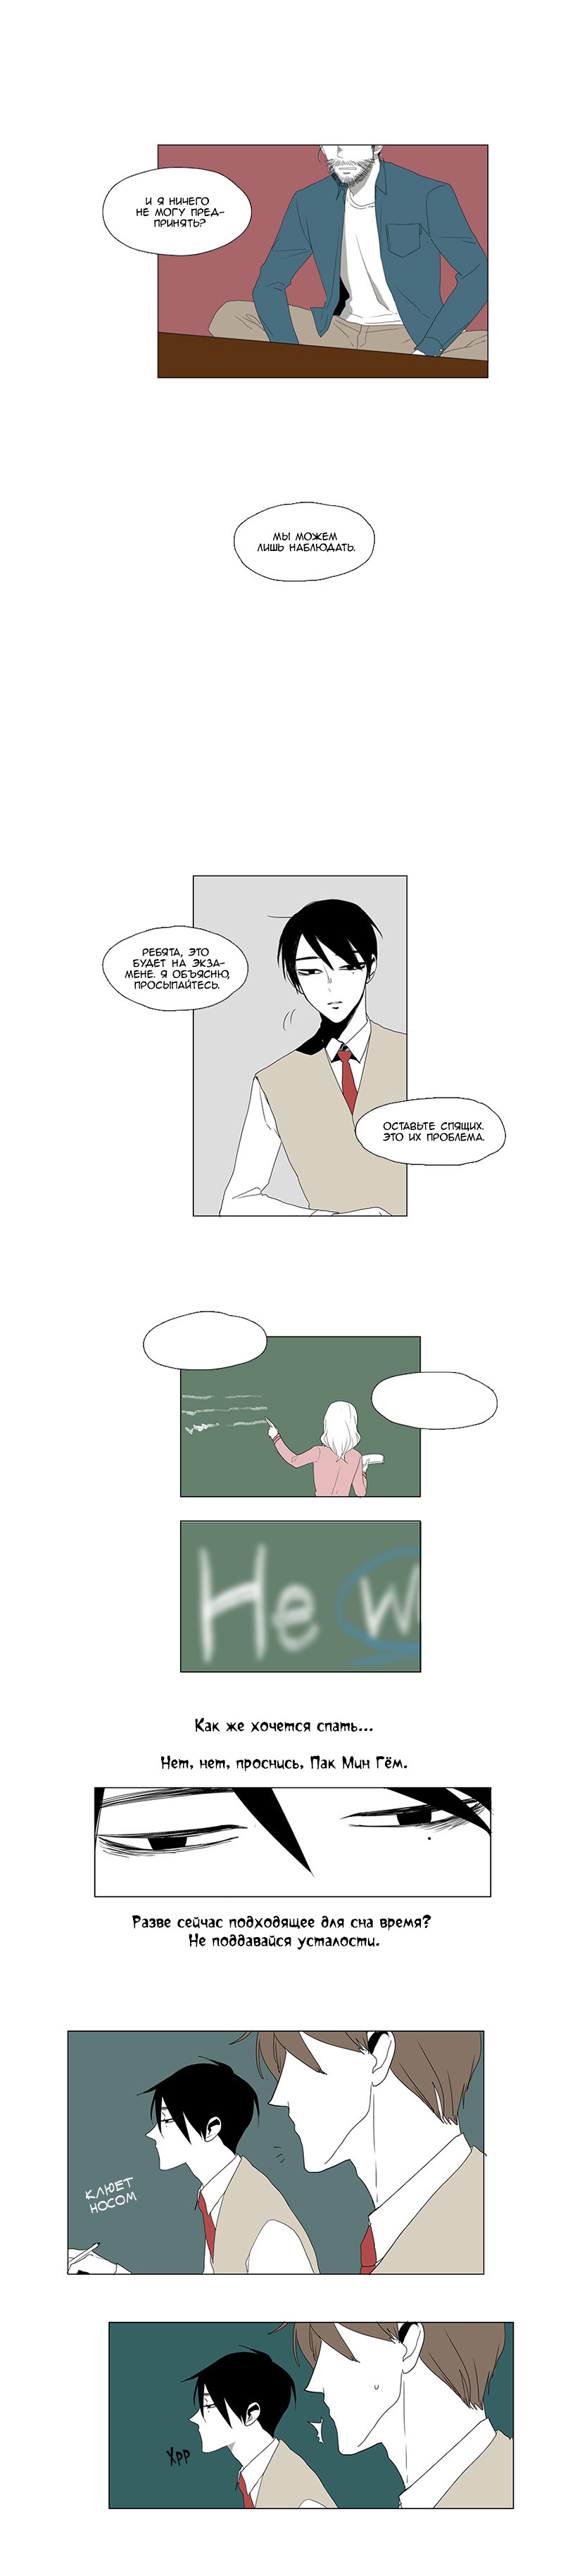 https://r1.ninemanga.com/comics/pic2/33/27873/278406/1447697135117.jpg Page 9